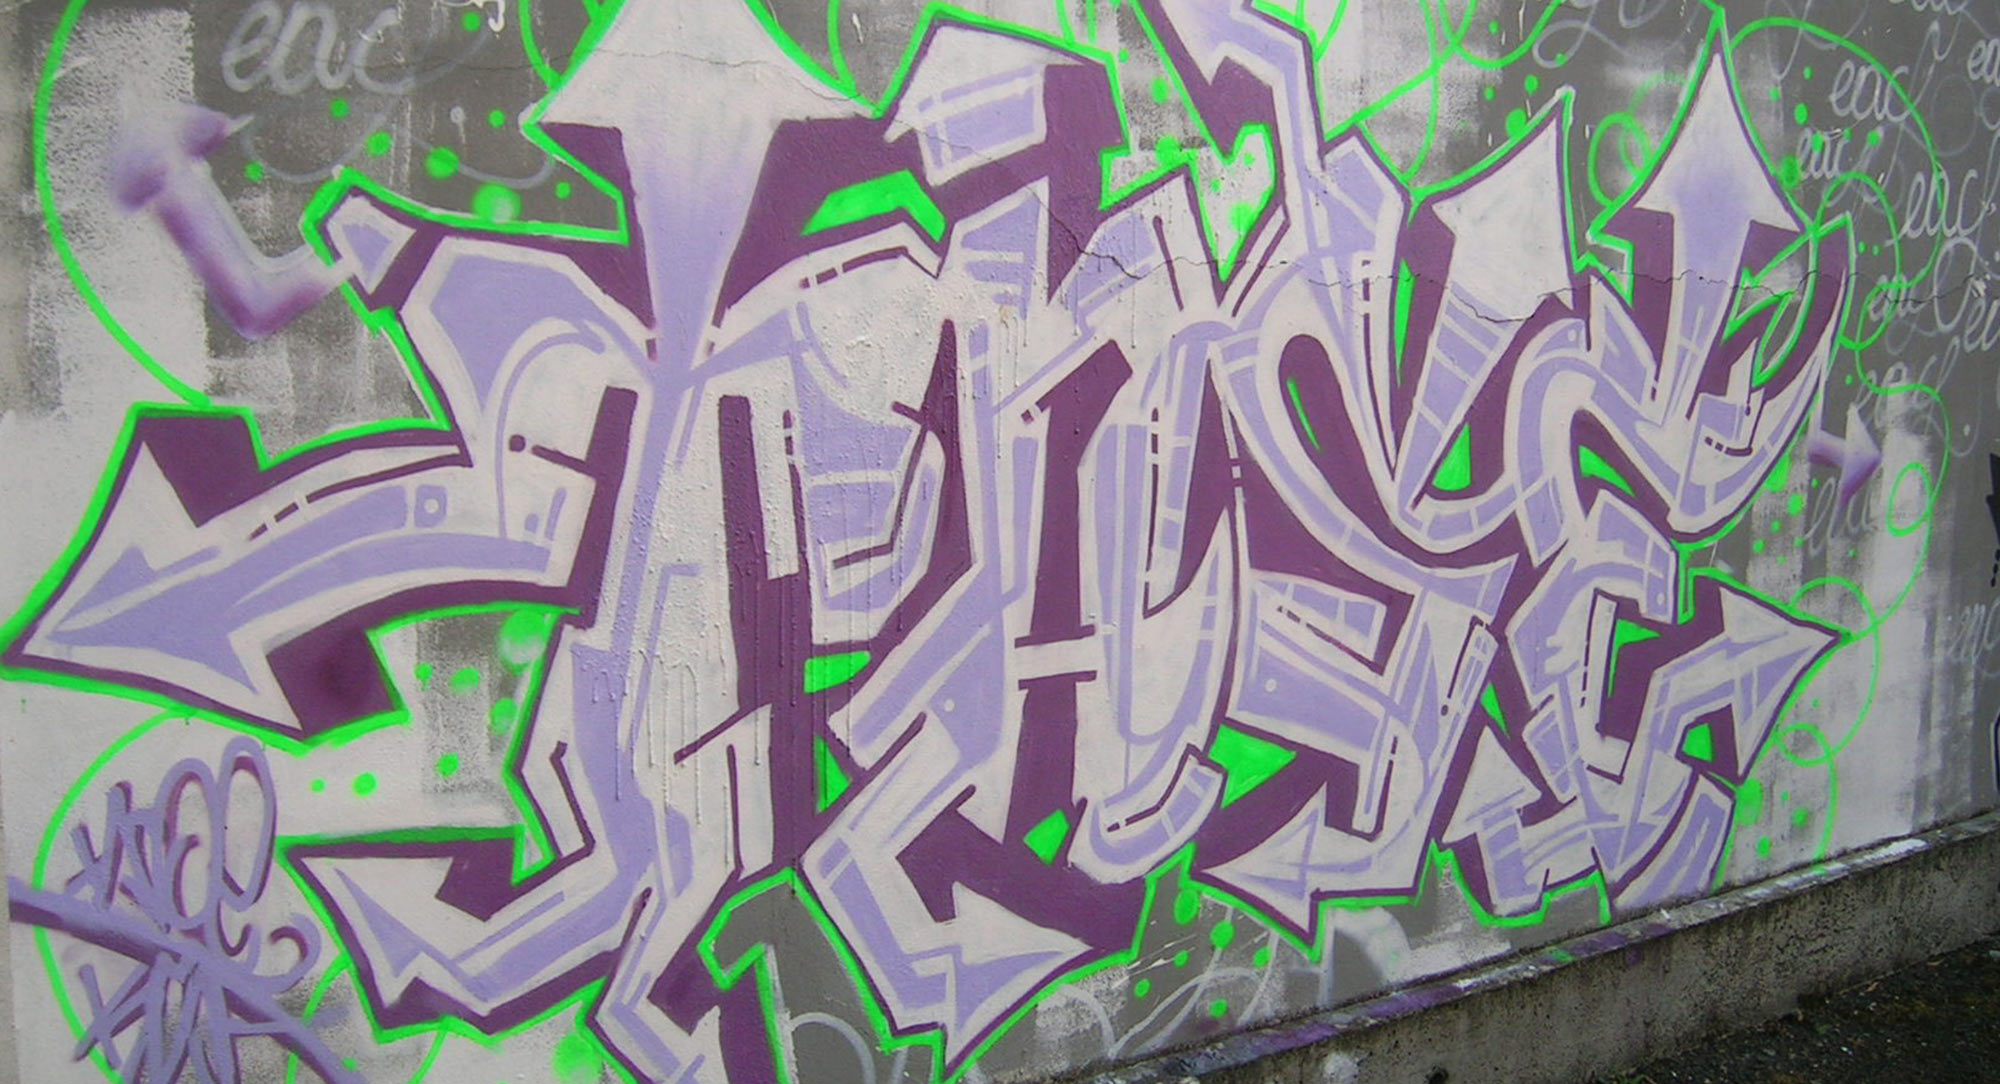 Tase - Graffiti - ENSACF - CLermont-Ferrand